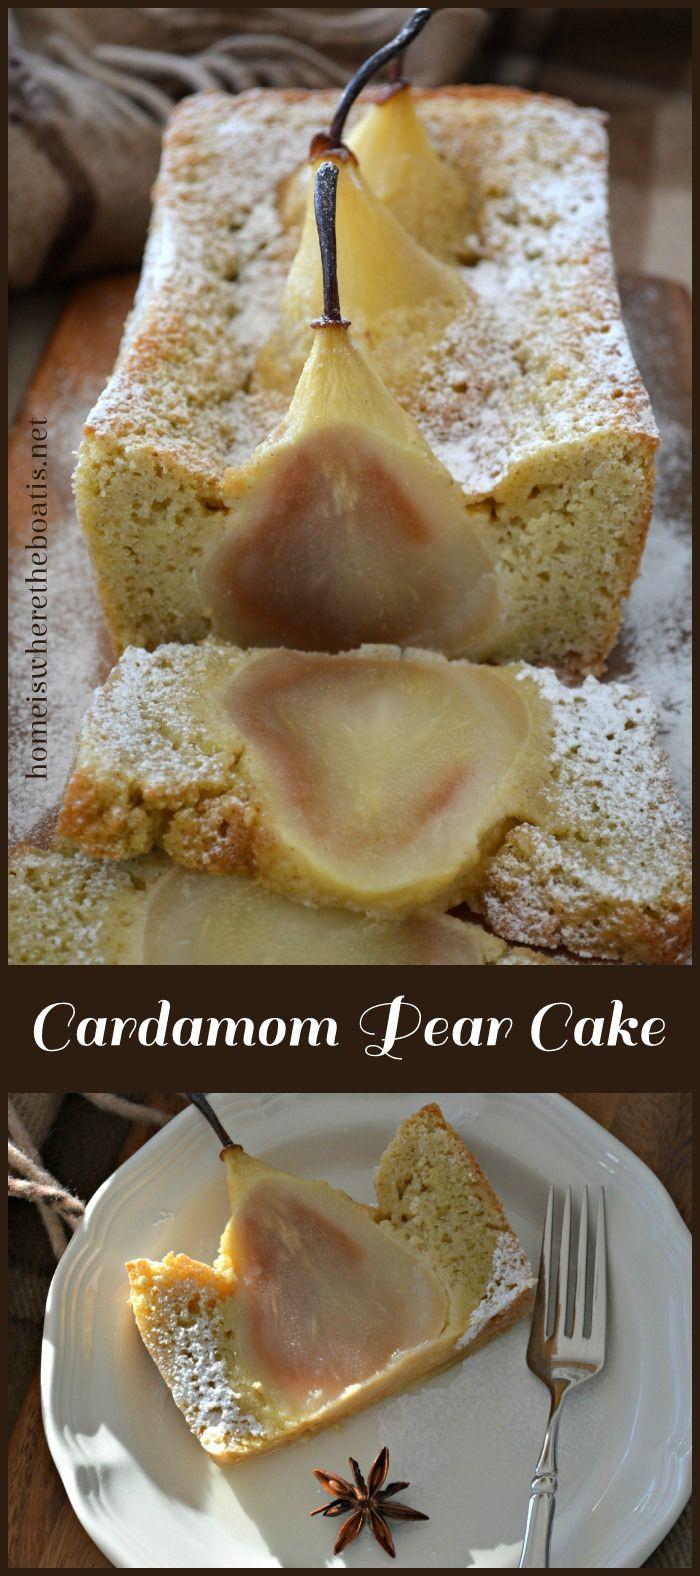 Cardamom Cake with Whole Pears #cake